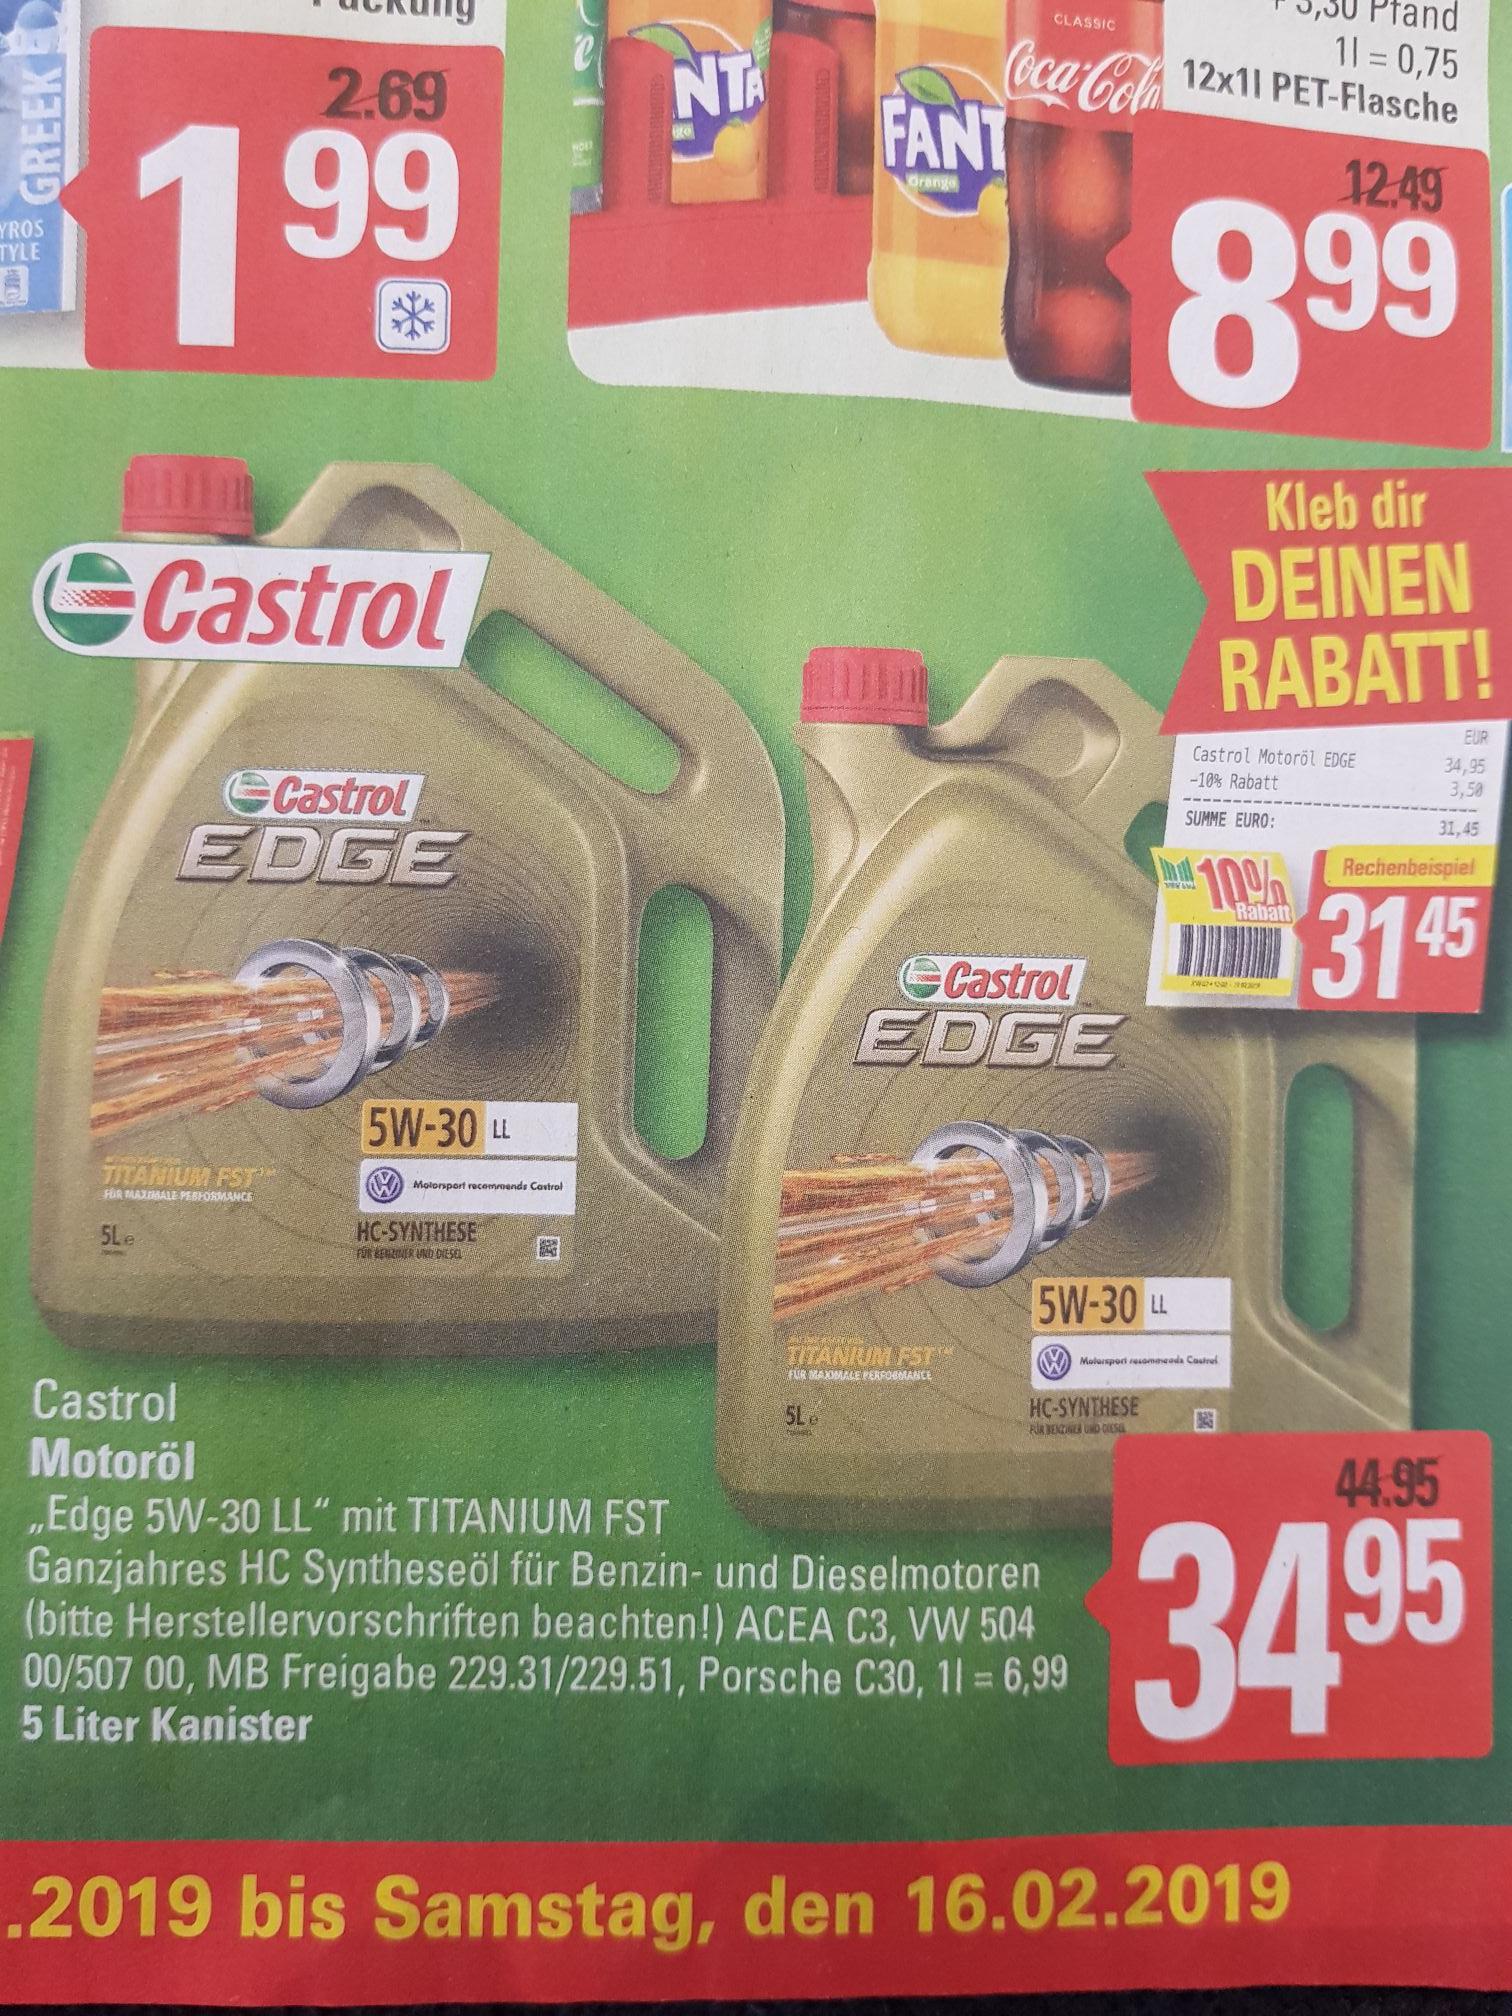 [Lokal] Castrol Edge 5W-30 LL Titanium FST